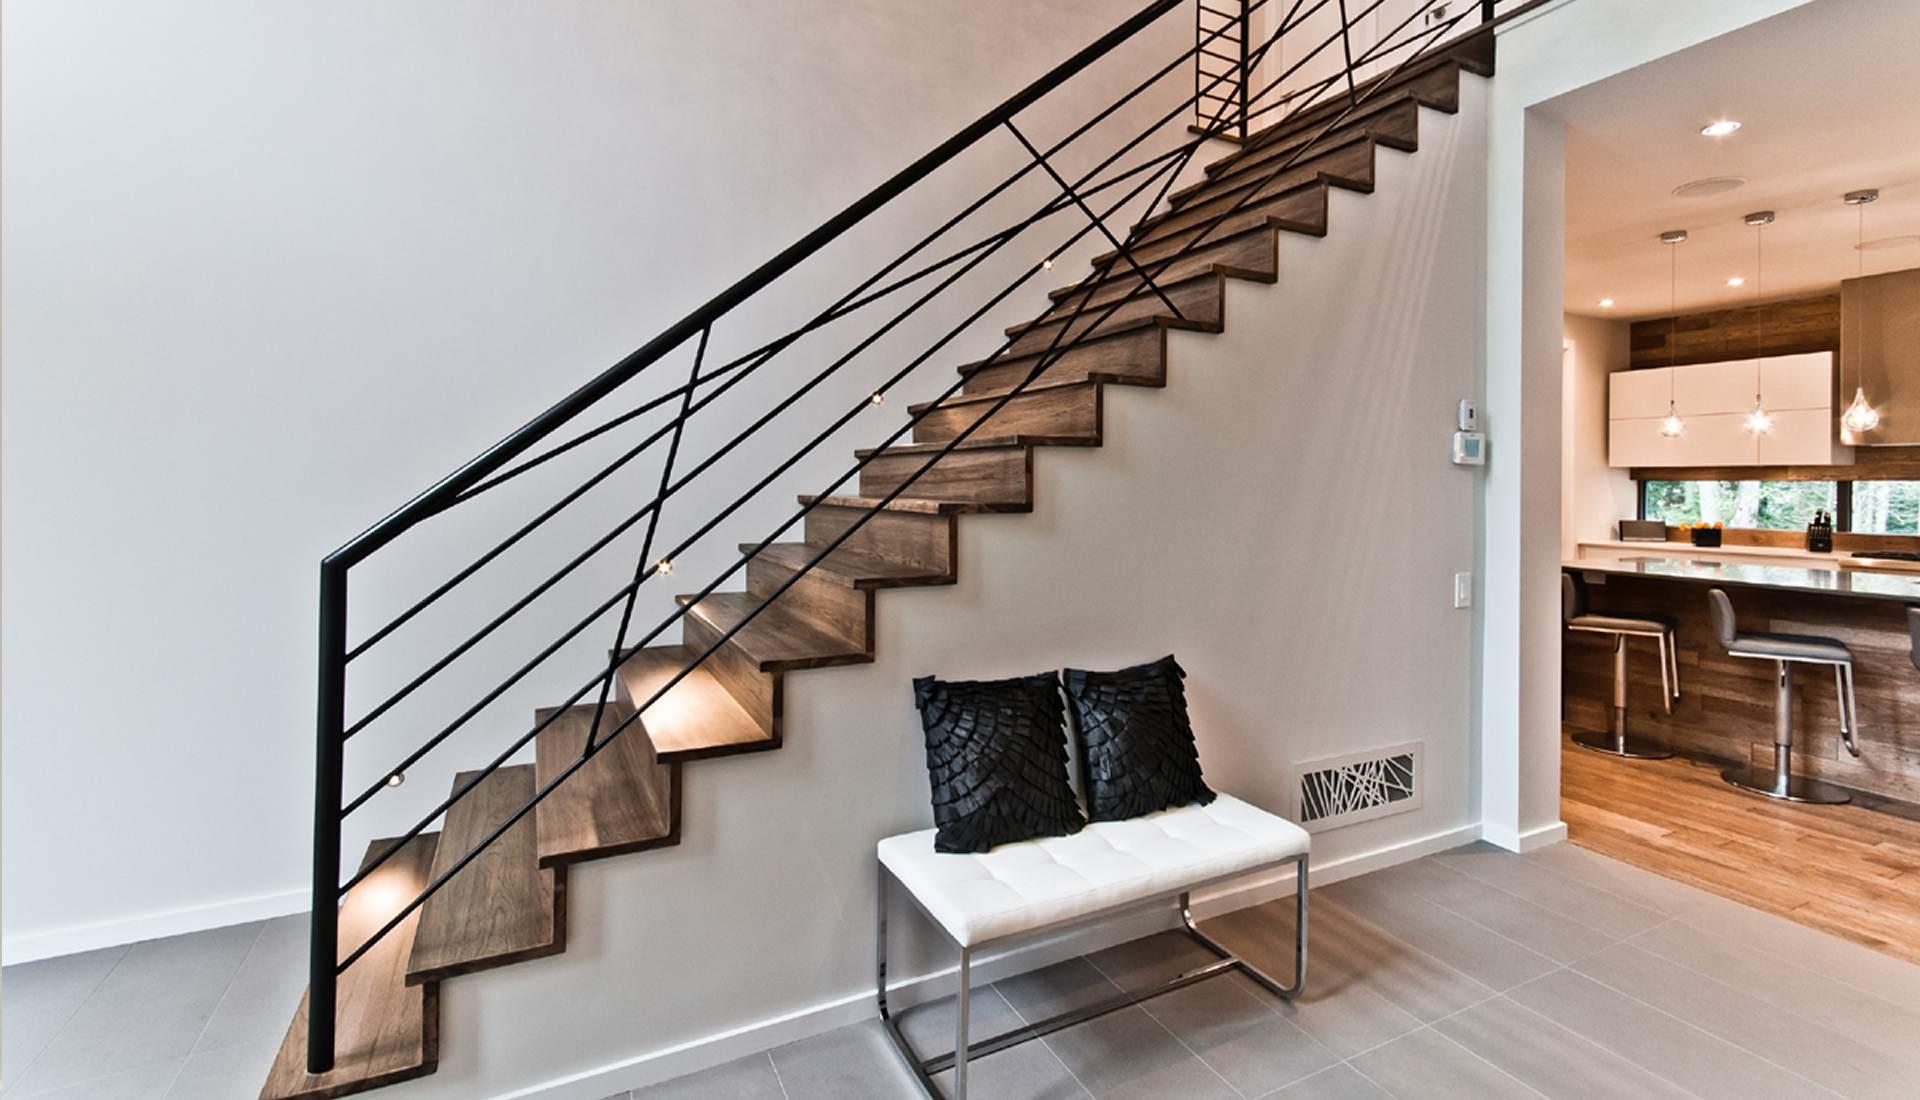 david gilbert escaliers bois et m tal photos. Black Bedroom Furniture Sets. Home Design Ideas